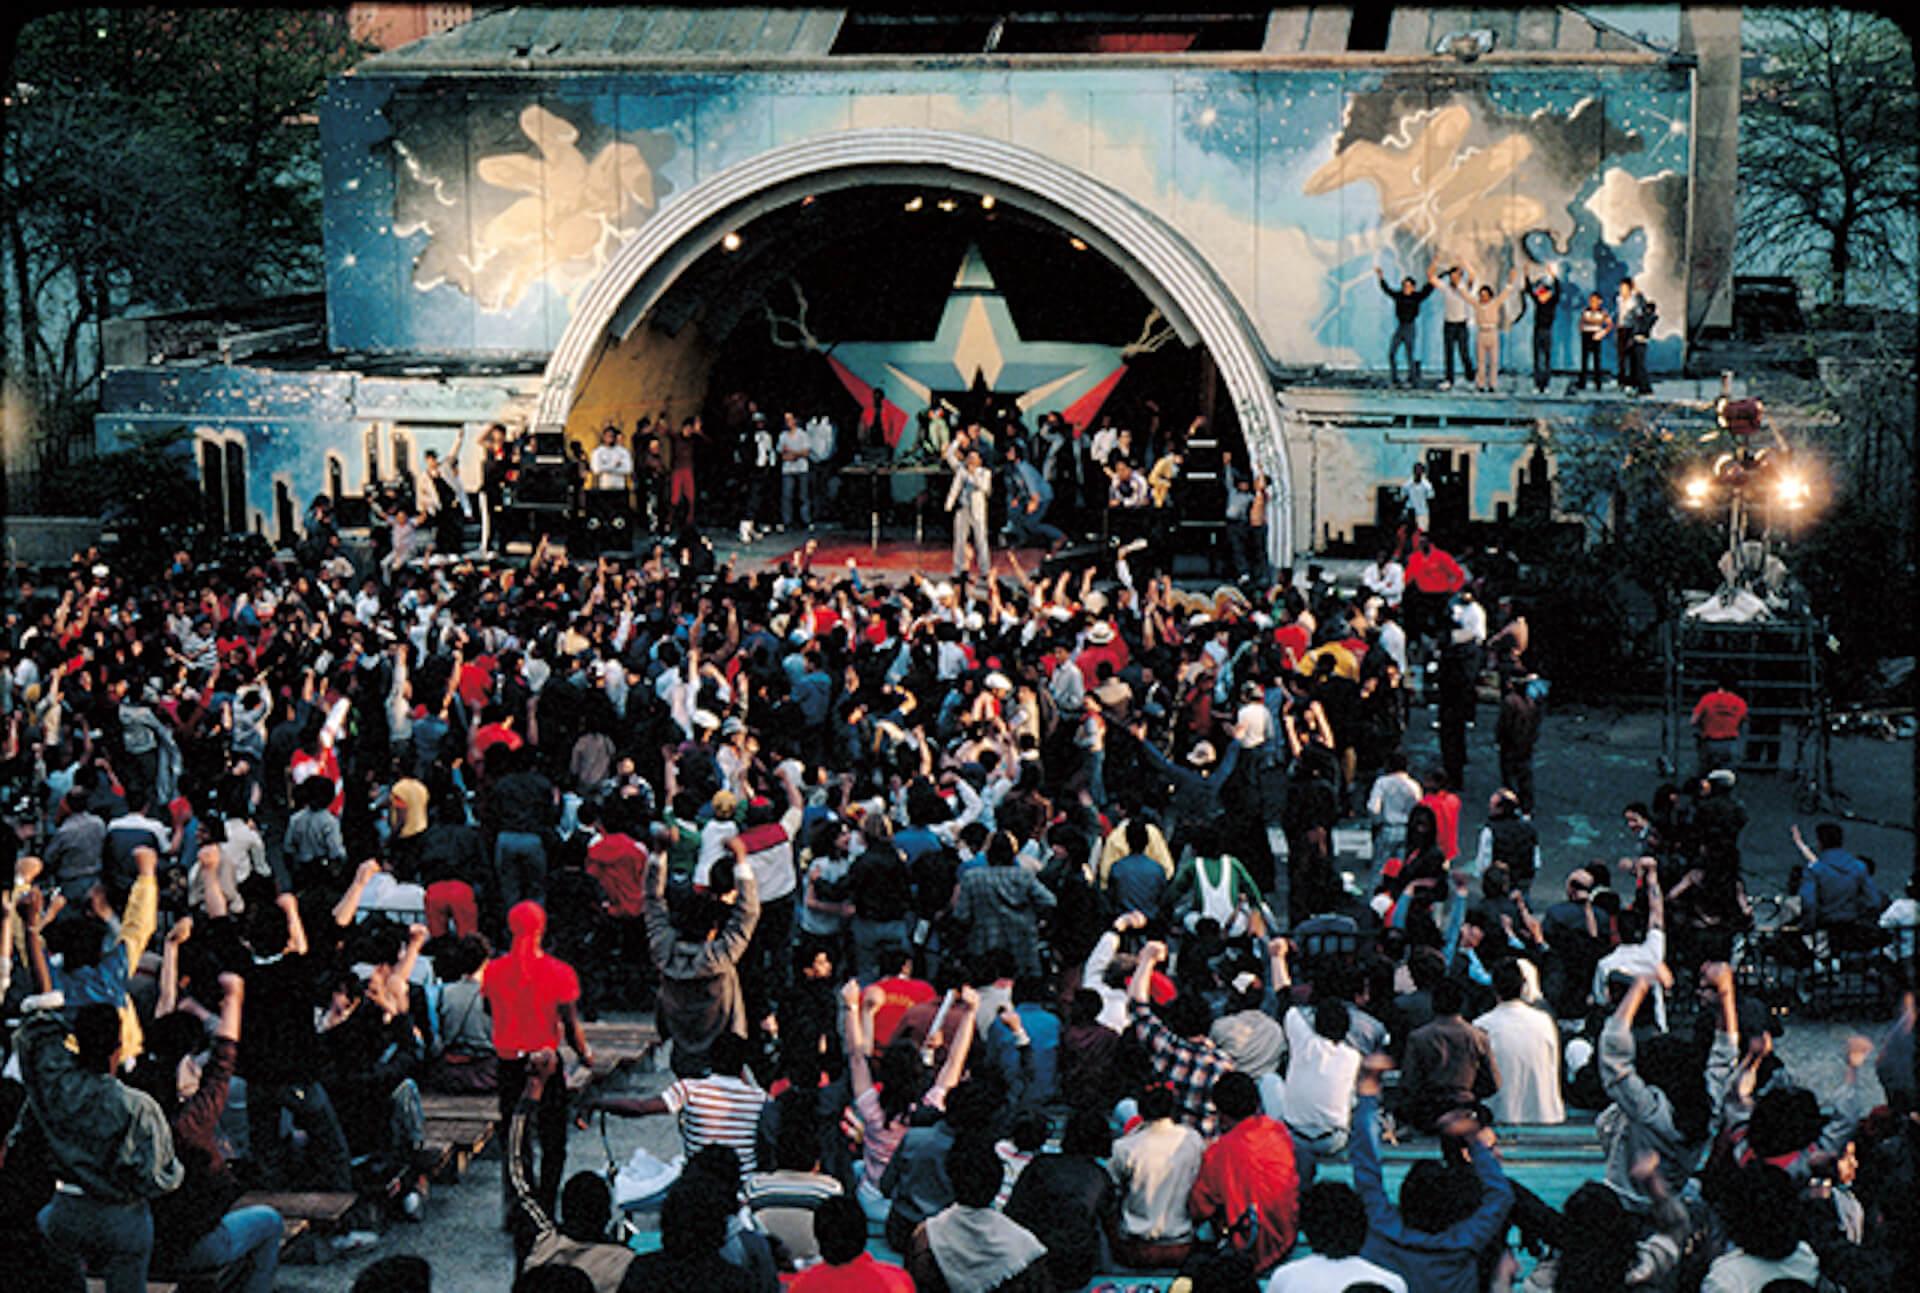 SOCIAL INNOVATION WEEK SHIBUYA 2019 90s HIP HOP EXPERIENCE